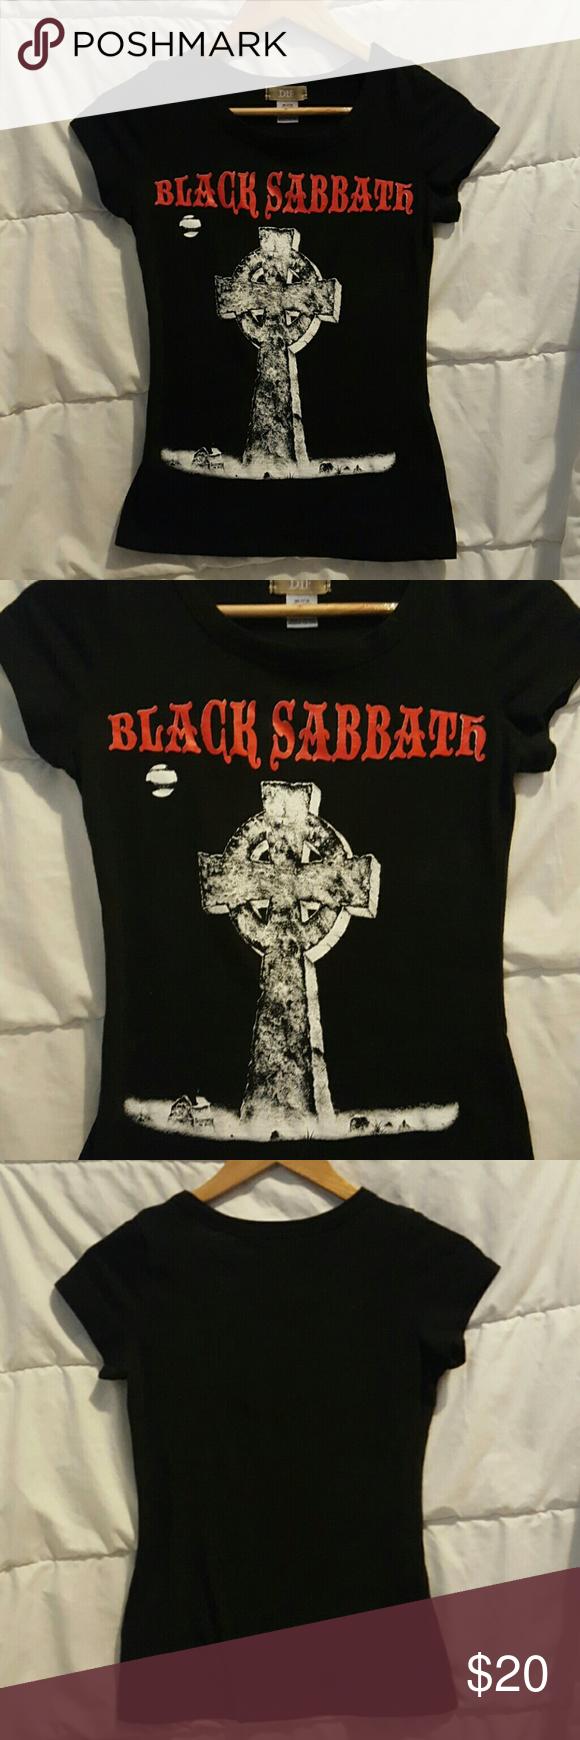 Black Sabbath tee Slim fit babydoll Black Sabbath t shirt. Very tight. Like new, no flaws. Too cool!! Weat with black skinny jeans! Tops Tees - Short Sleeve